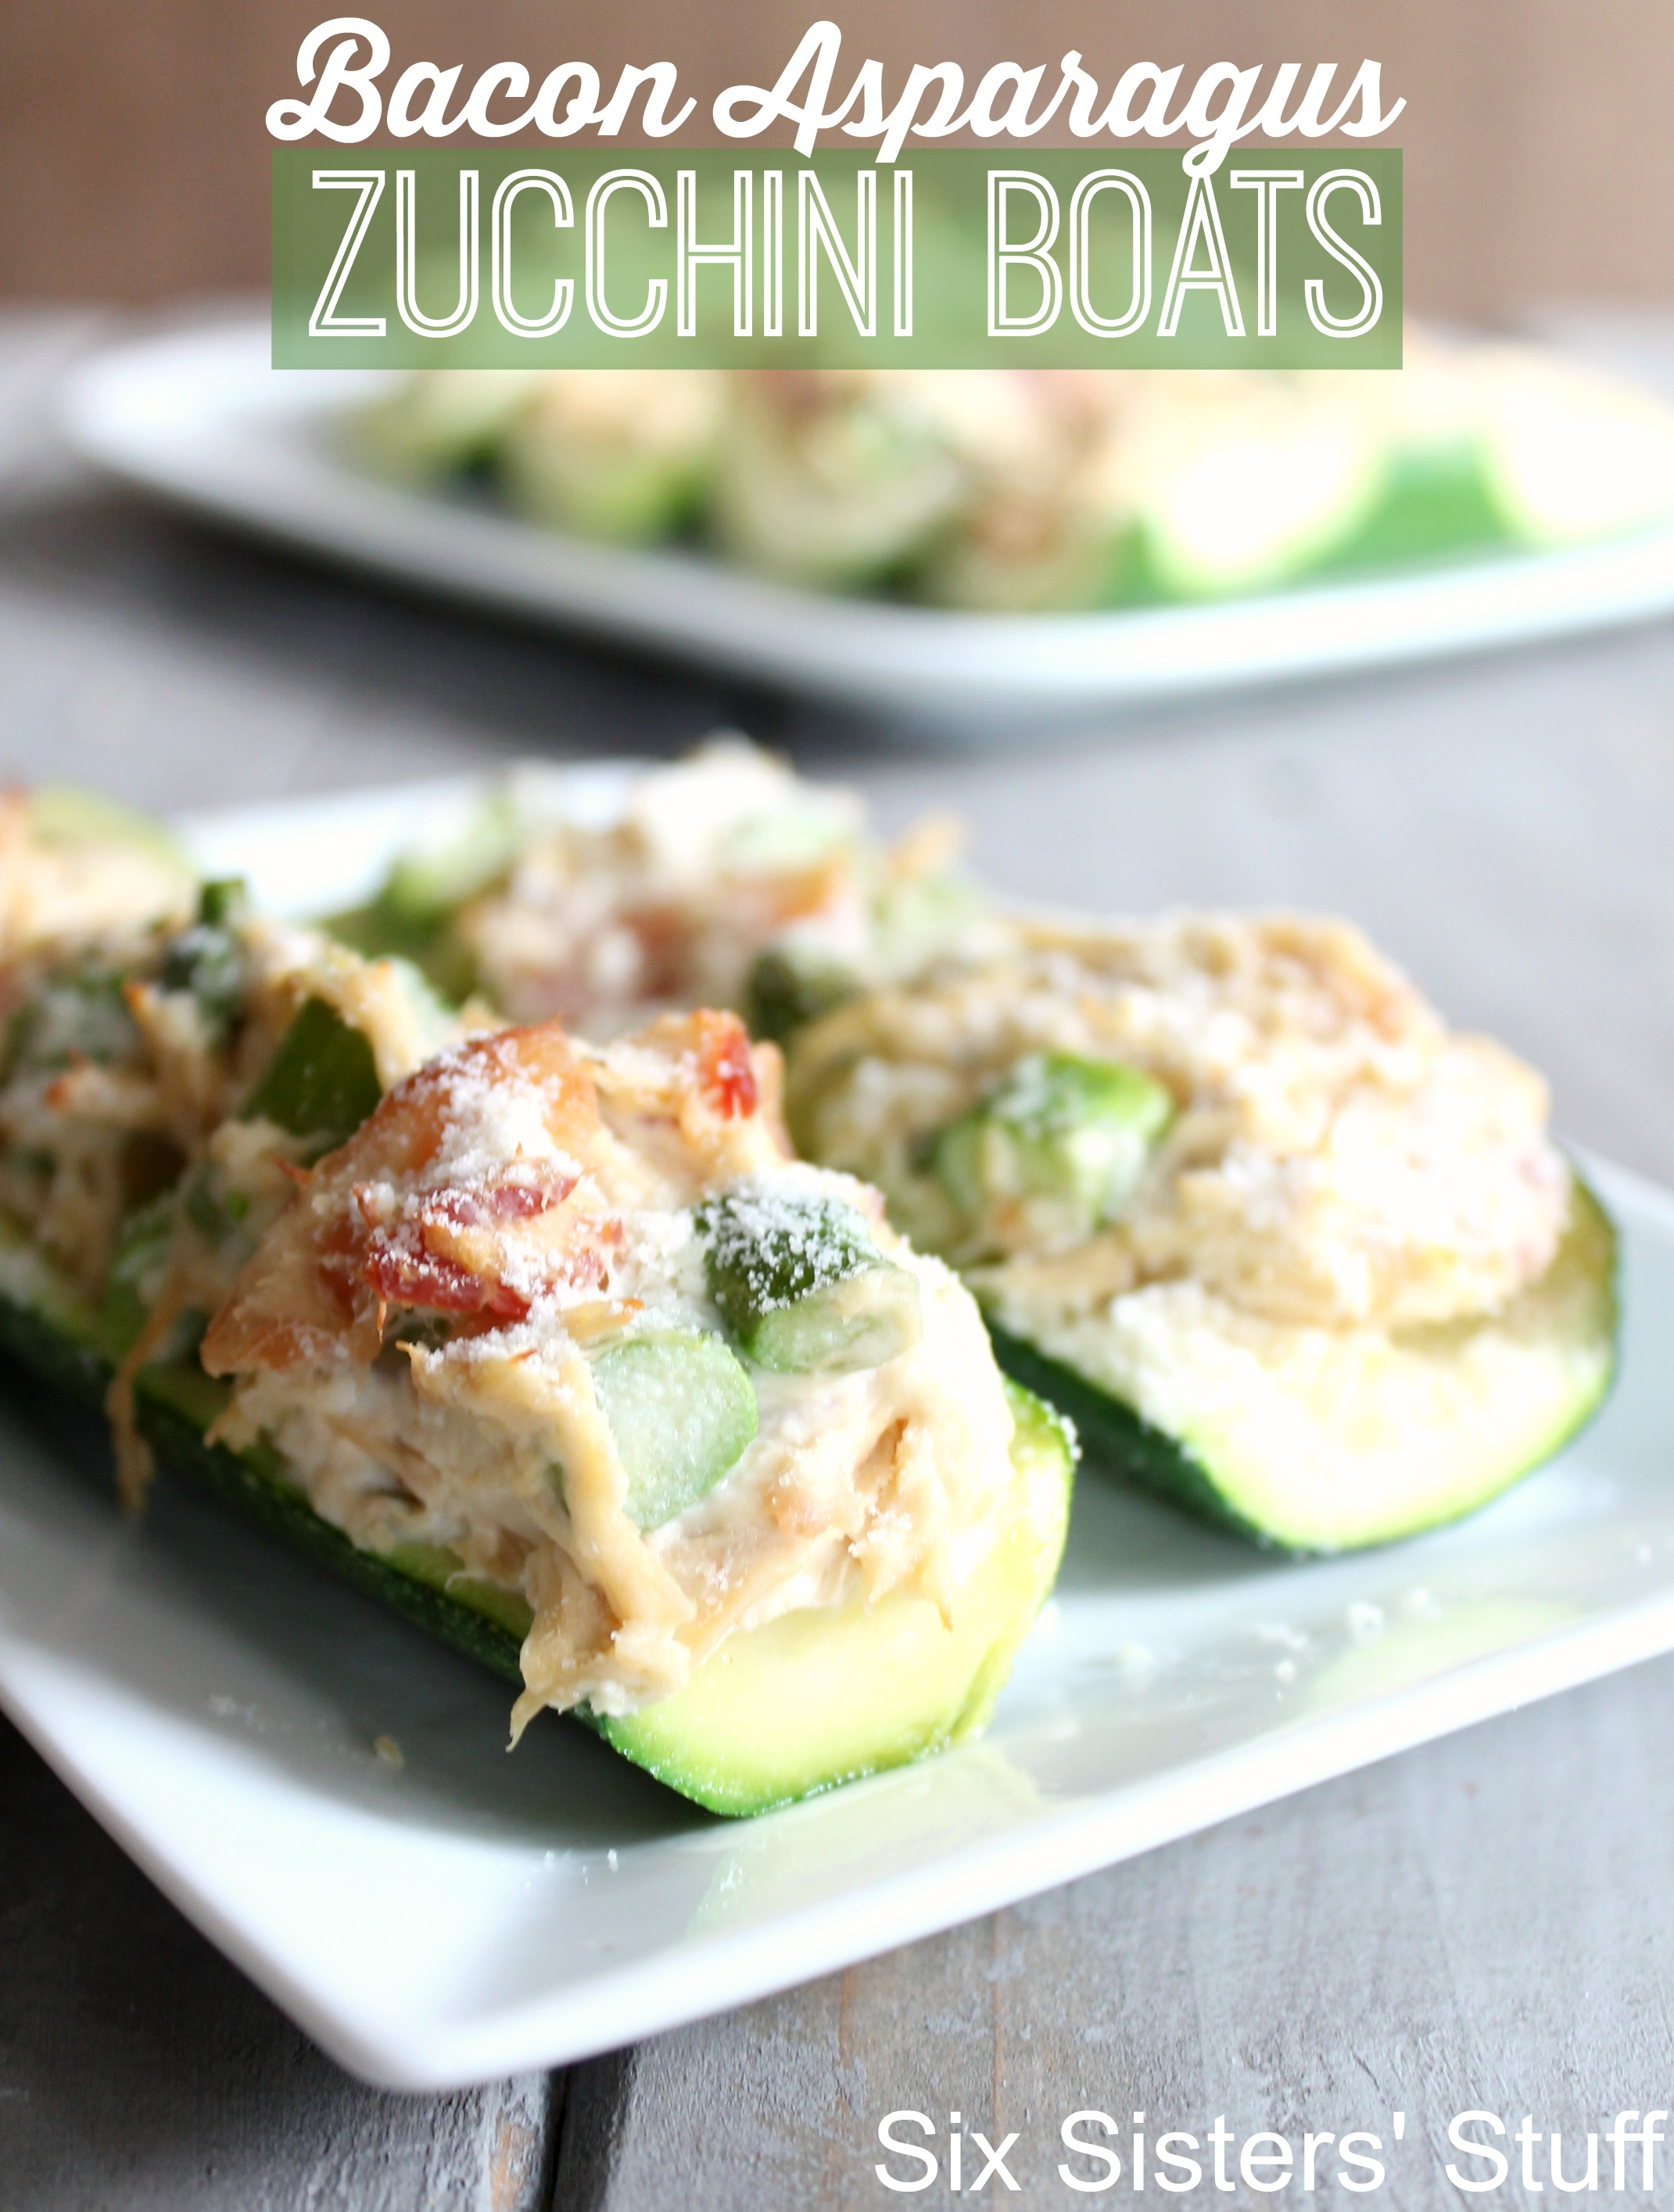 Bacon Asparagus Zucchini Boats